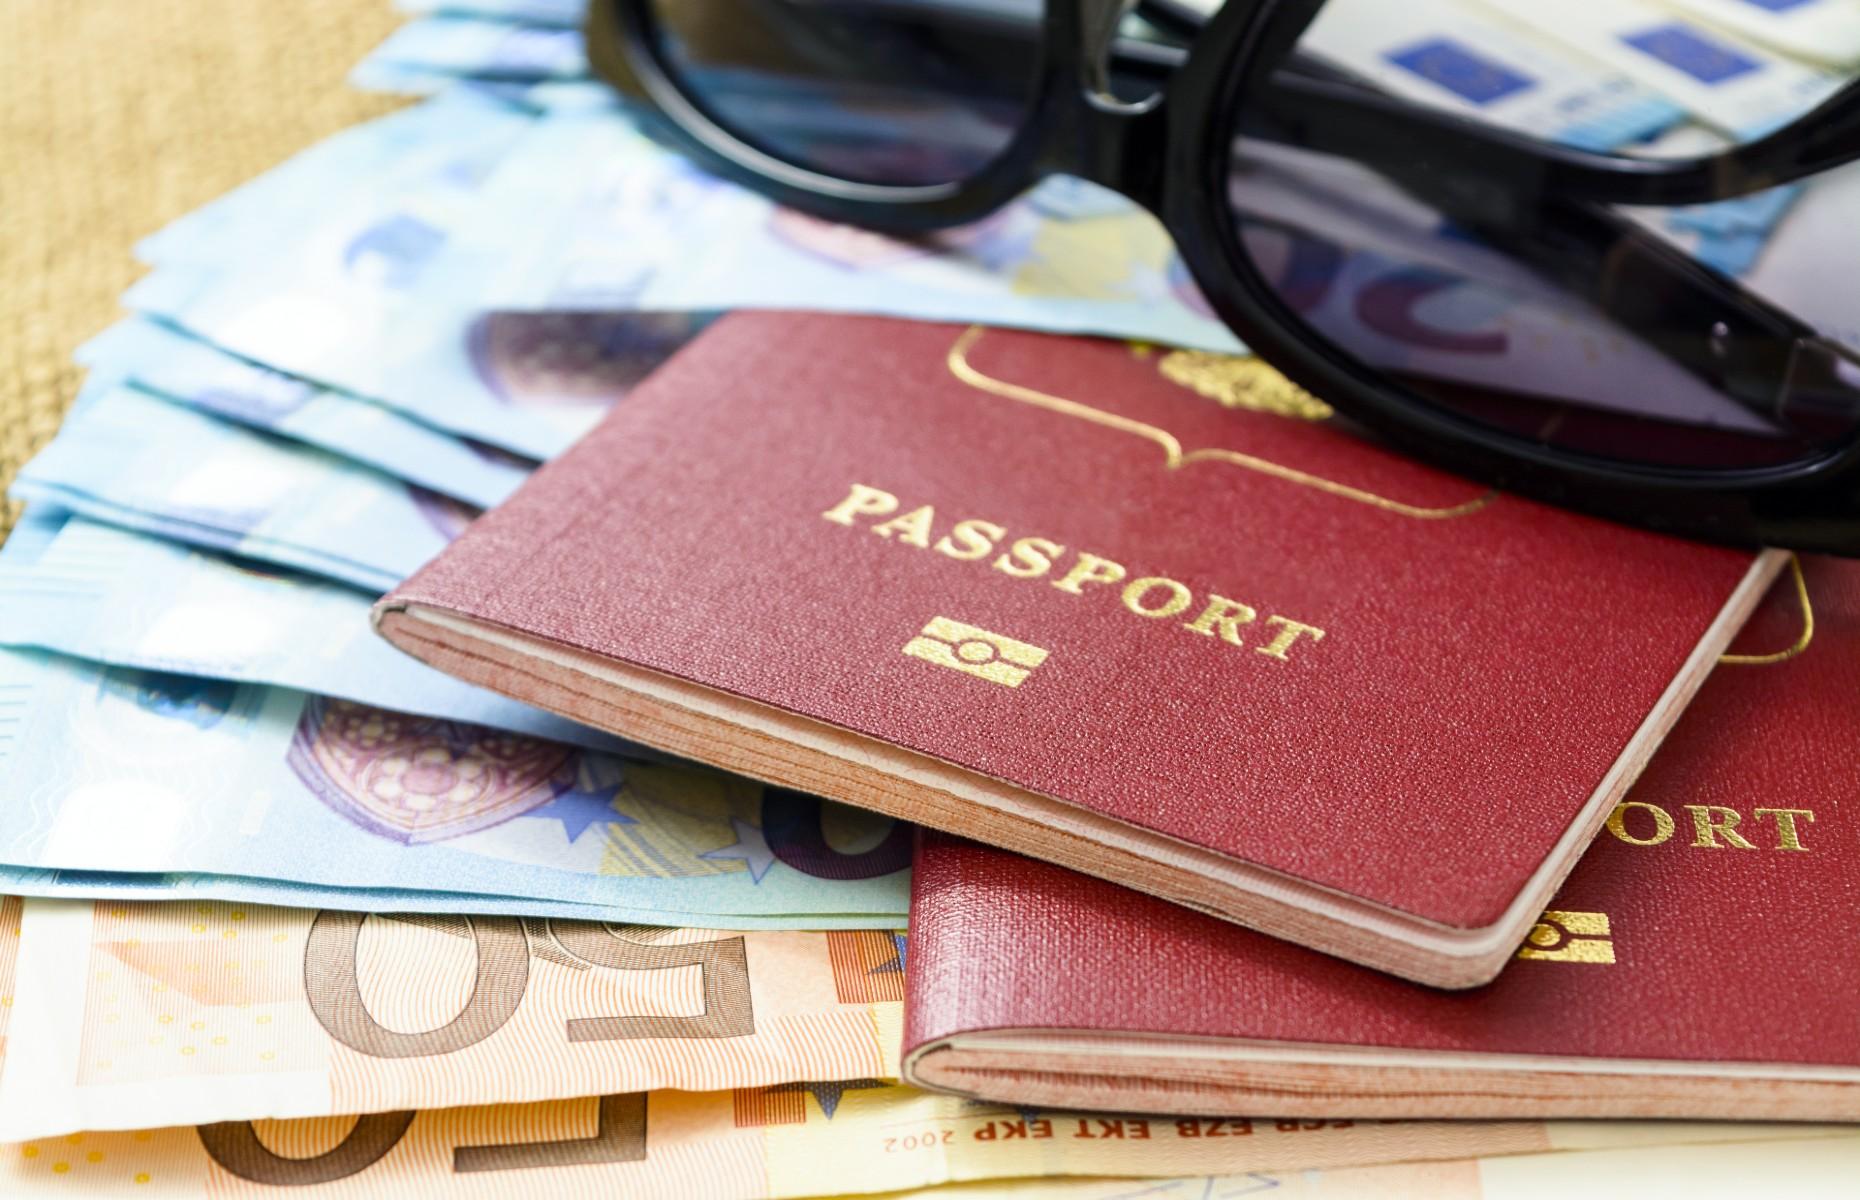 Travel documents and passport (Image: Ruslan Galiullin/Shutterstock)